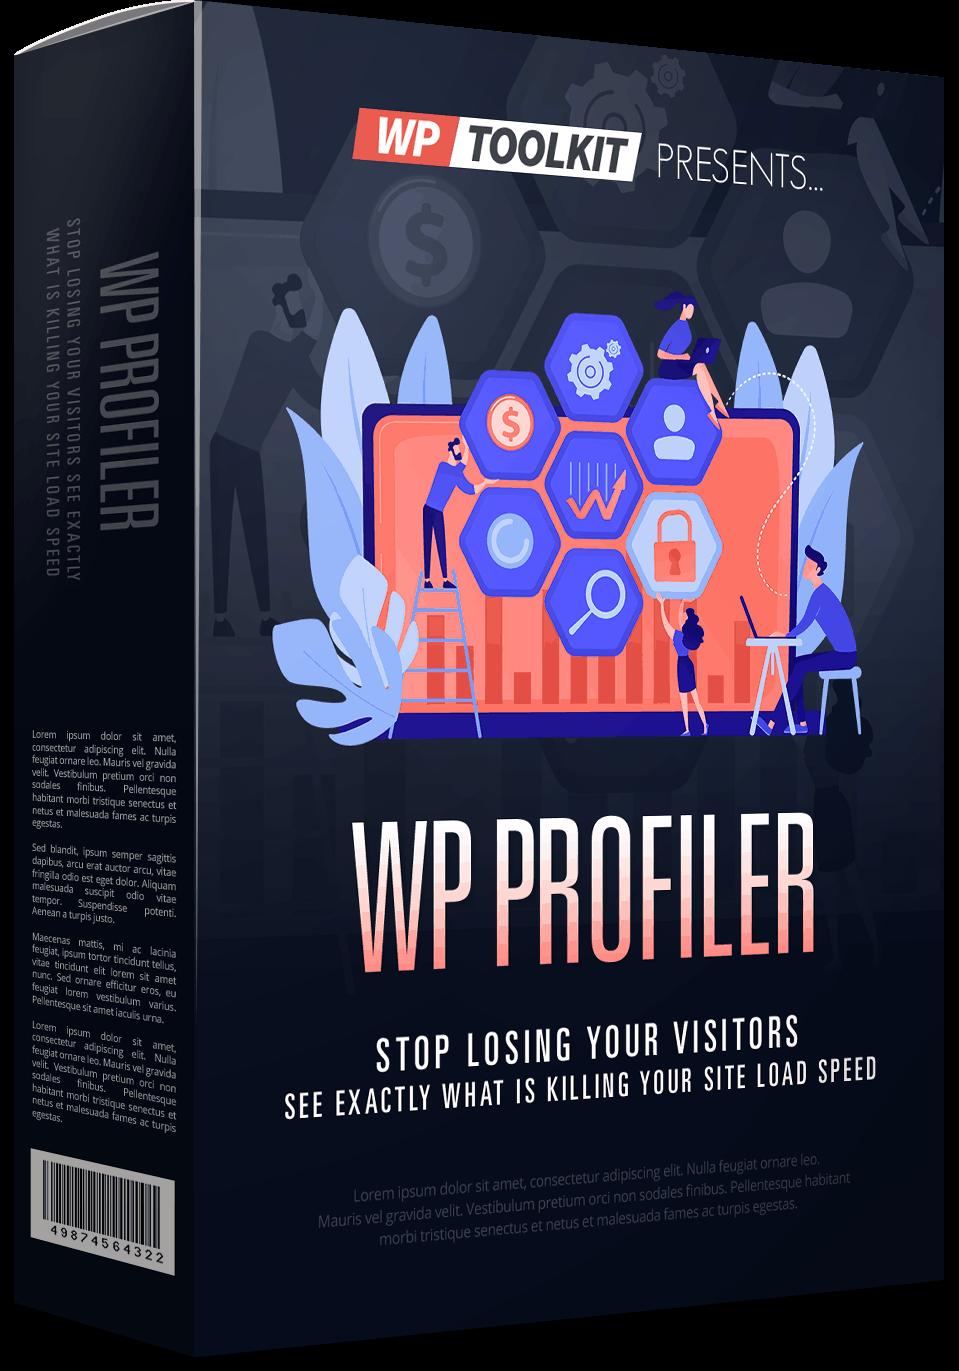 WP Profiler Review